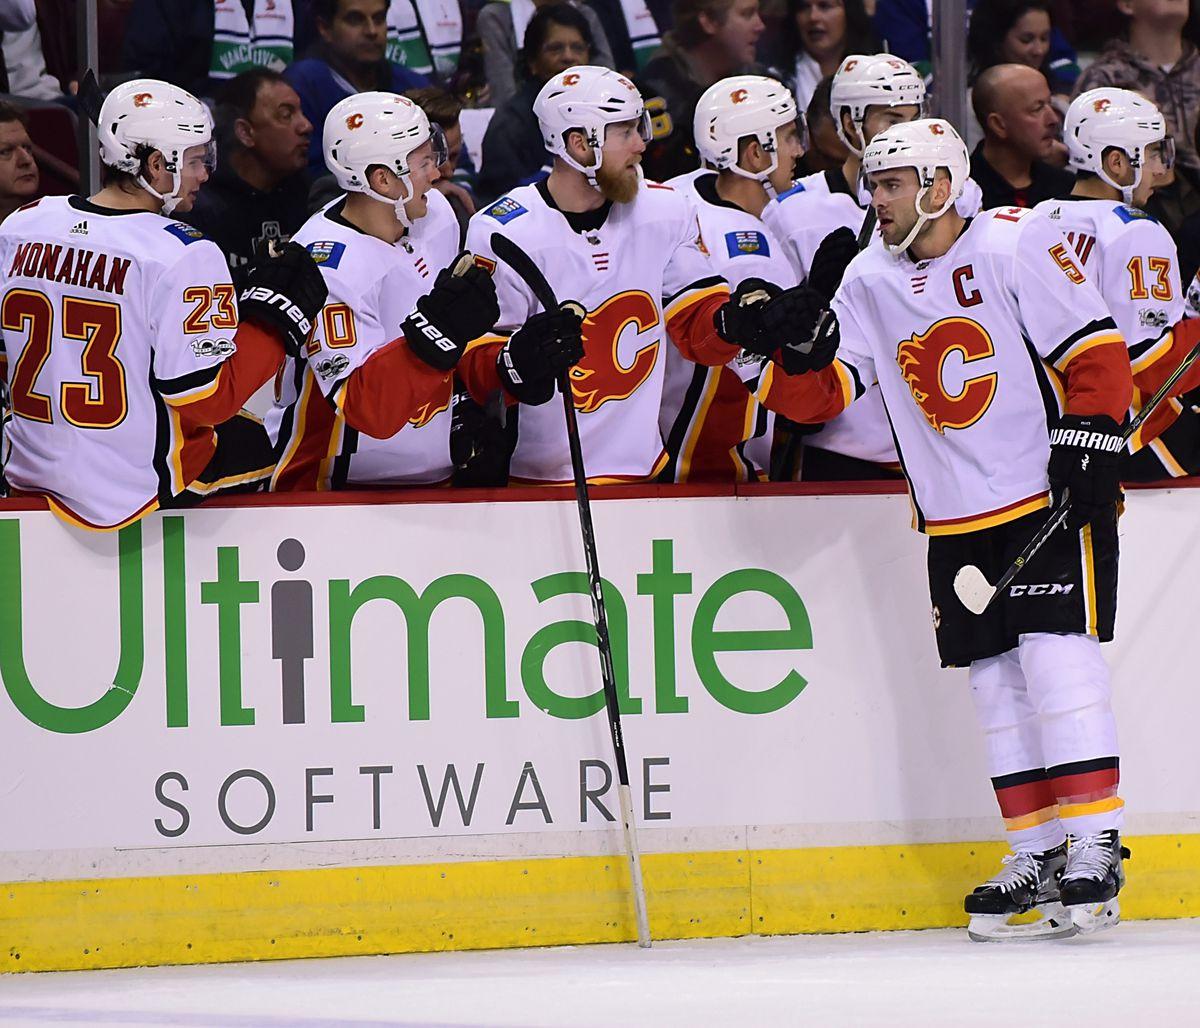 NHL: Calgary Flames at Vancouver Canucks